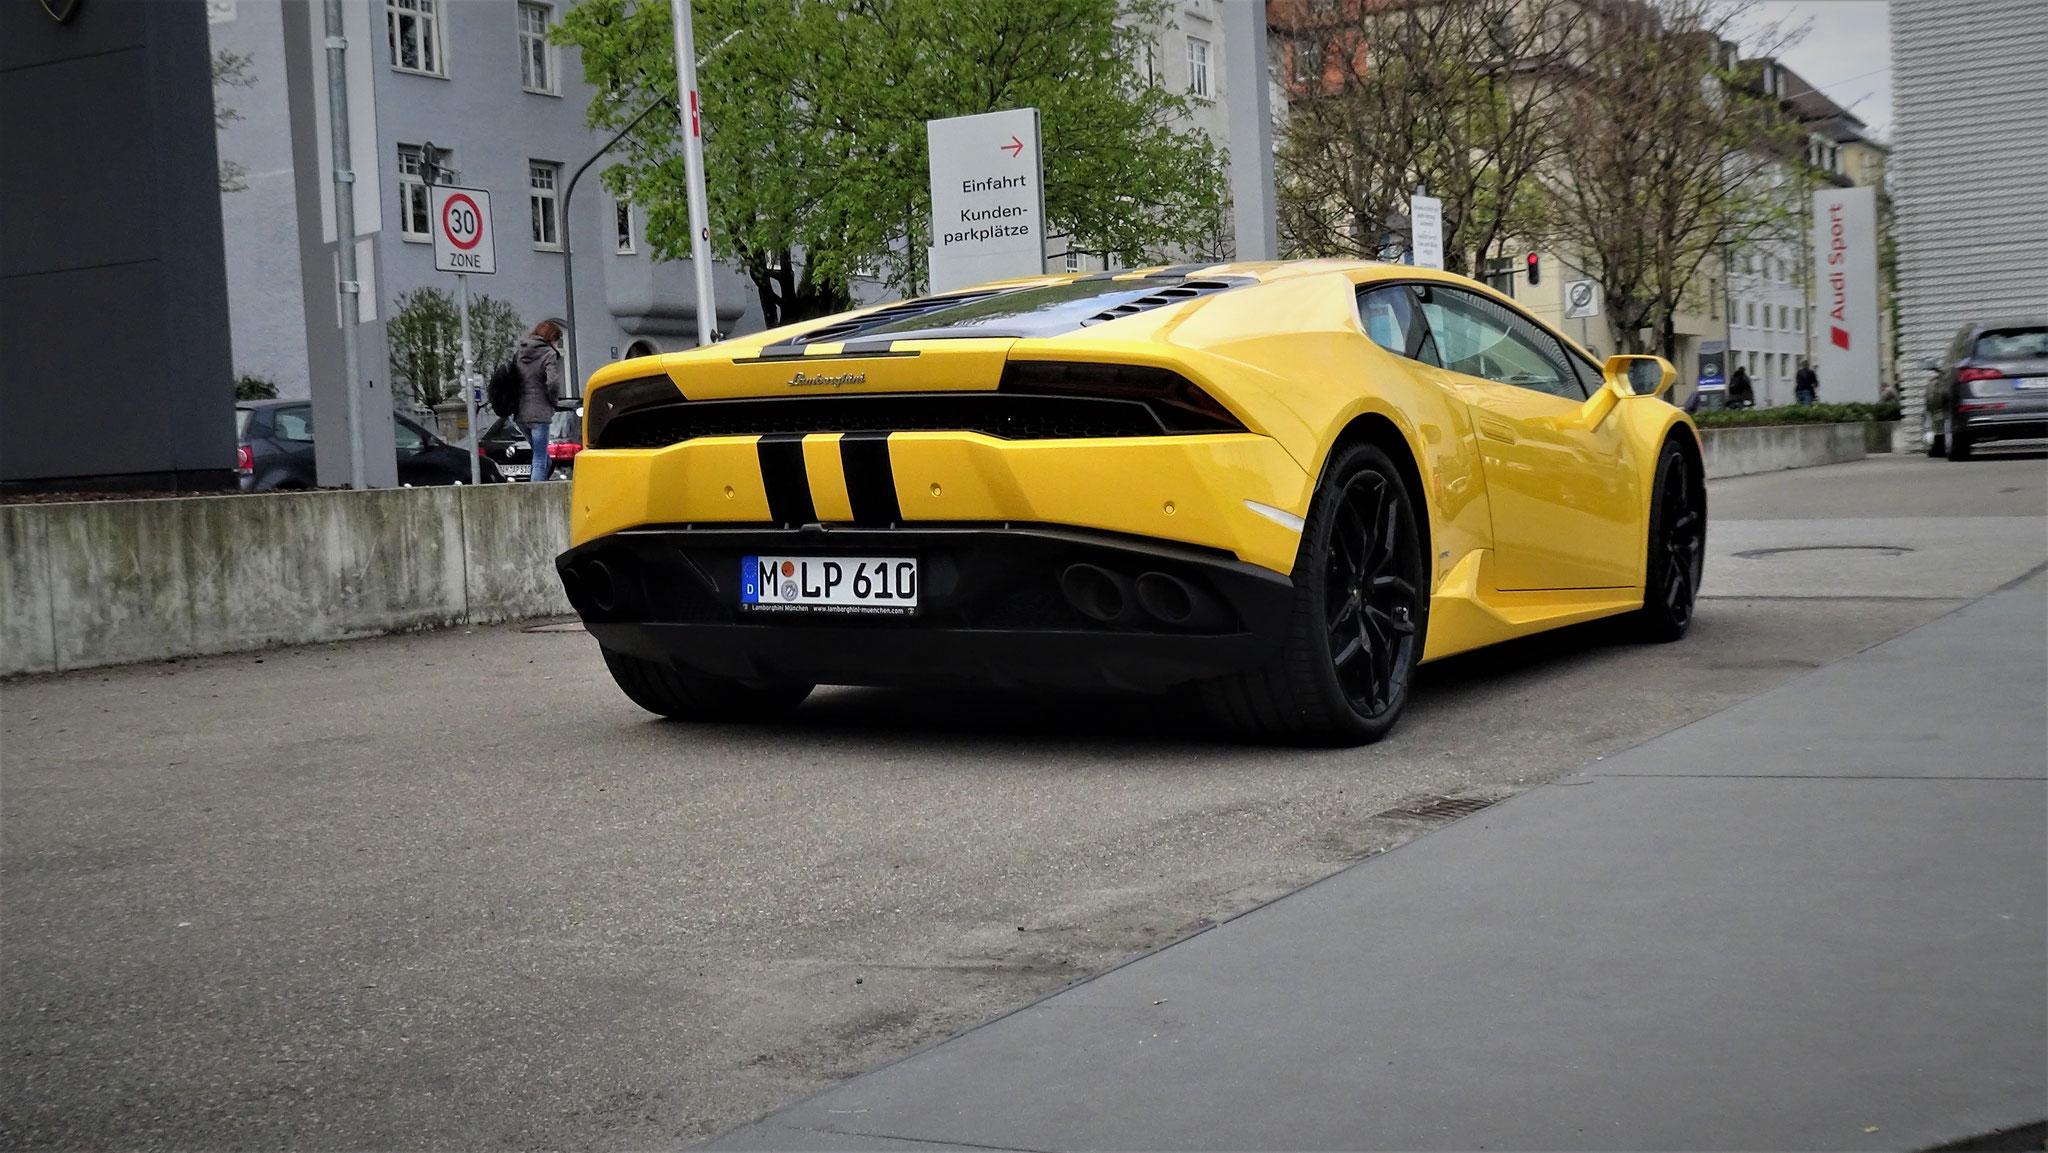 Lamborghini Huracan - M-LP-610